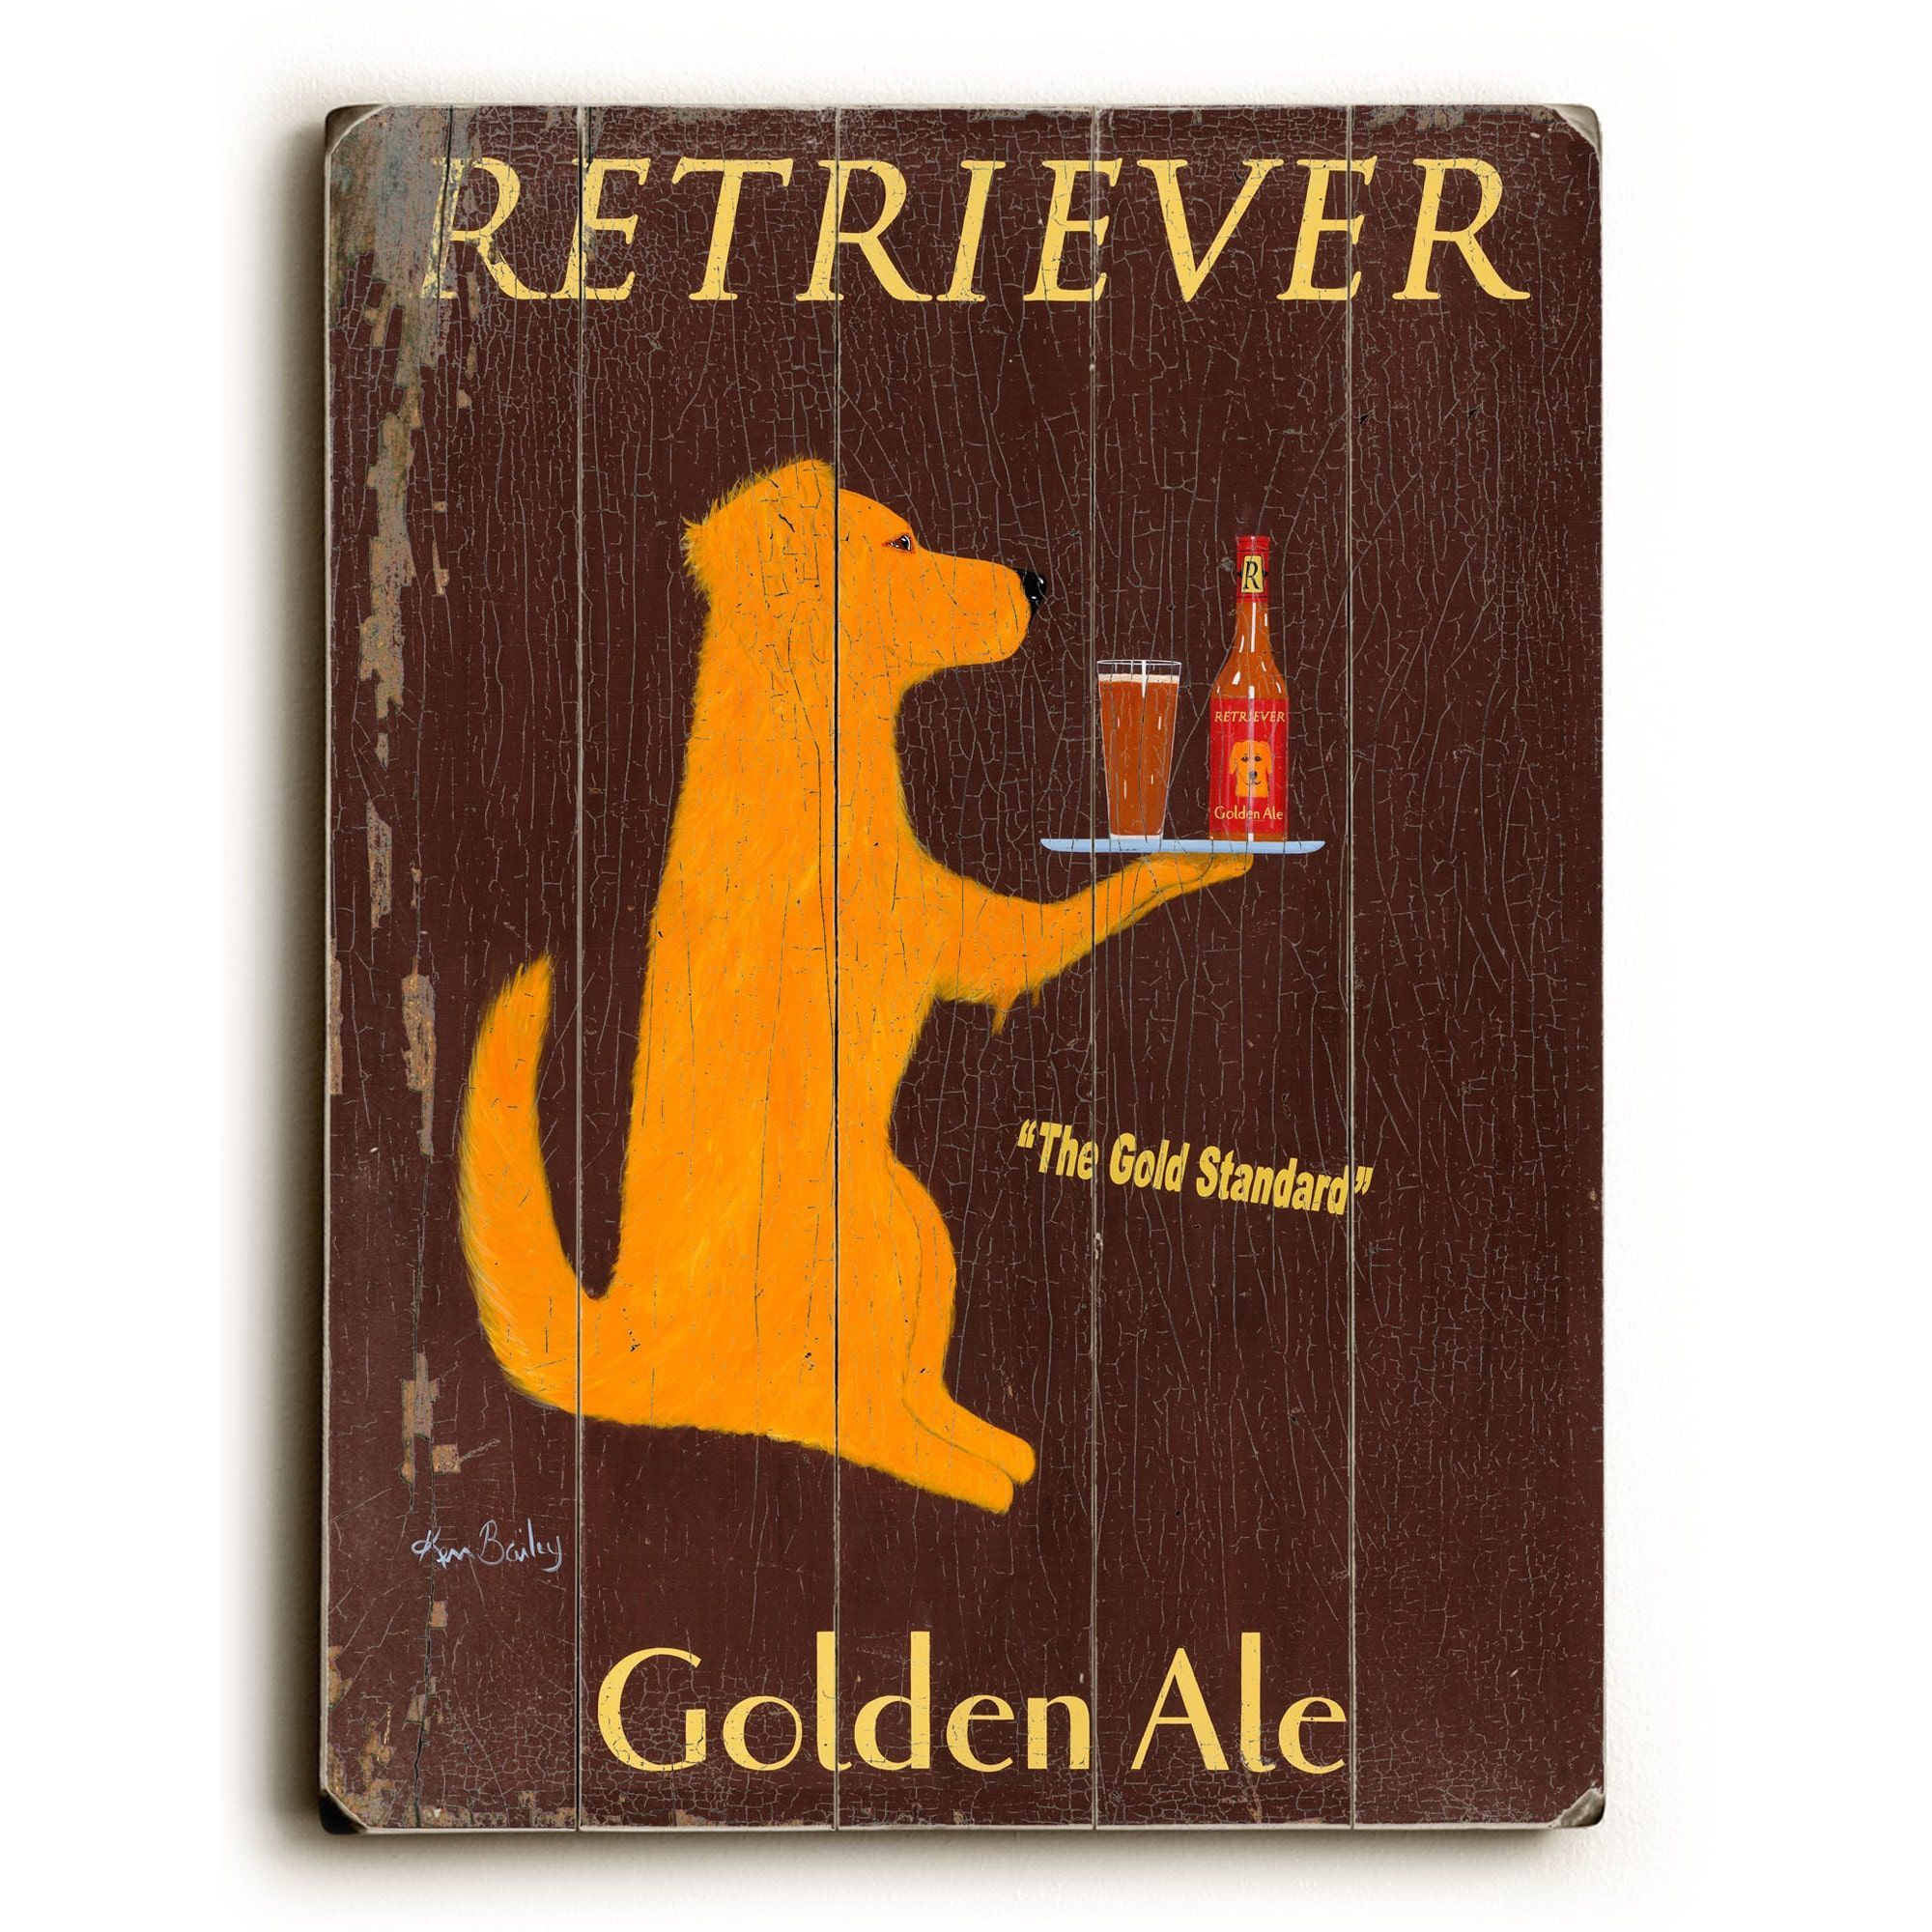 7c9f780493ecd Retriever Golden Ale - Wall Decor by Ken Bailey (30 x 40 - Planked ...